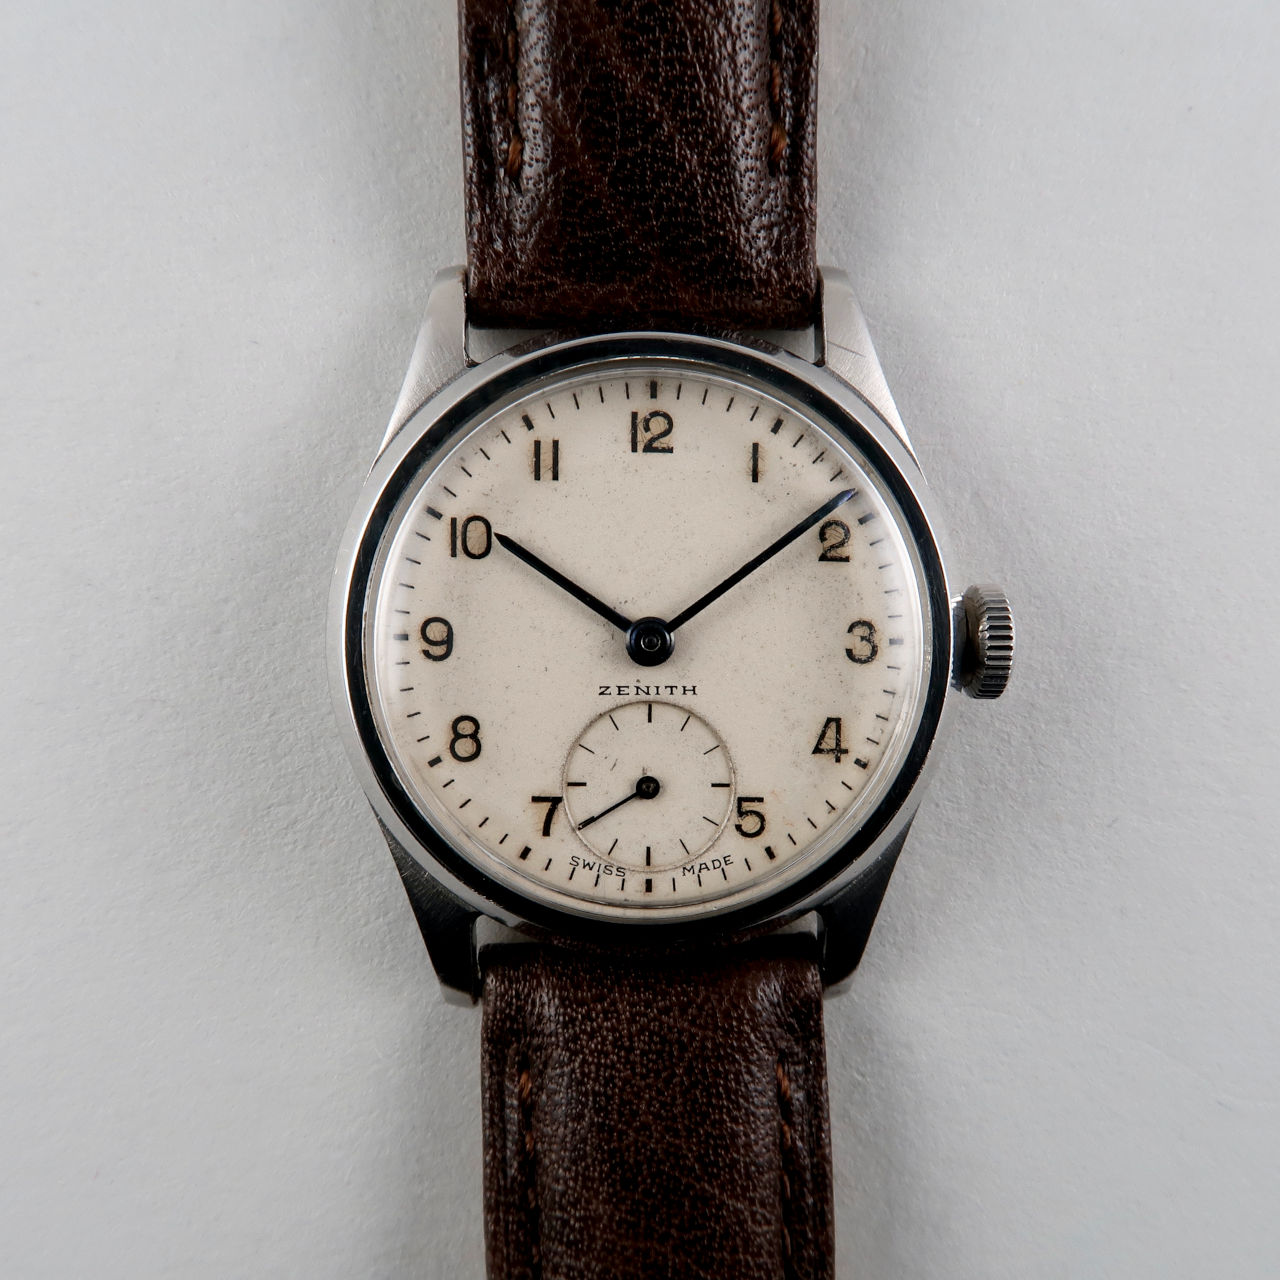 Zenith Cal. 106-6 circa 1950   steel mid-sized manual wind wristwatch